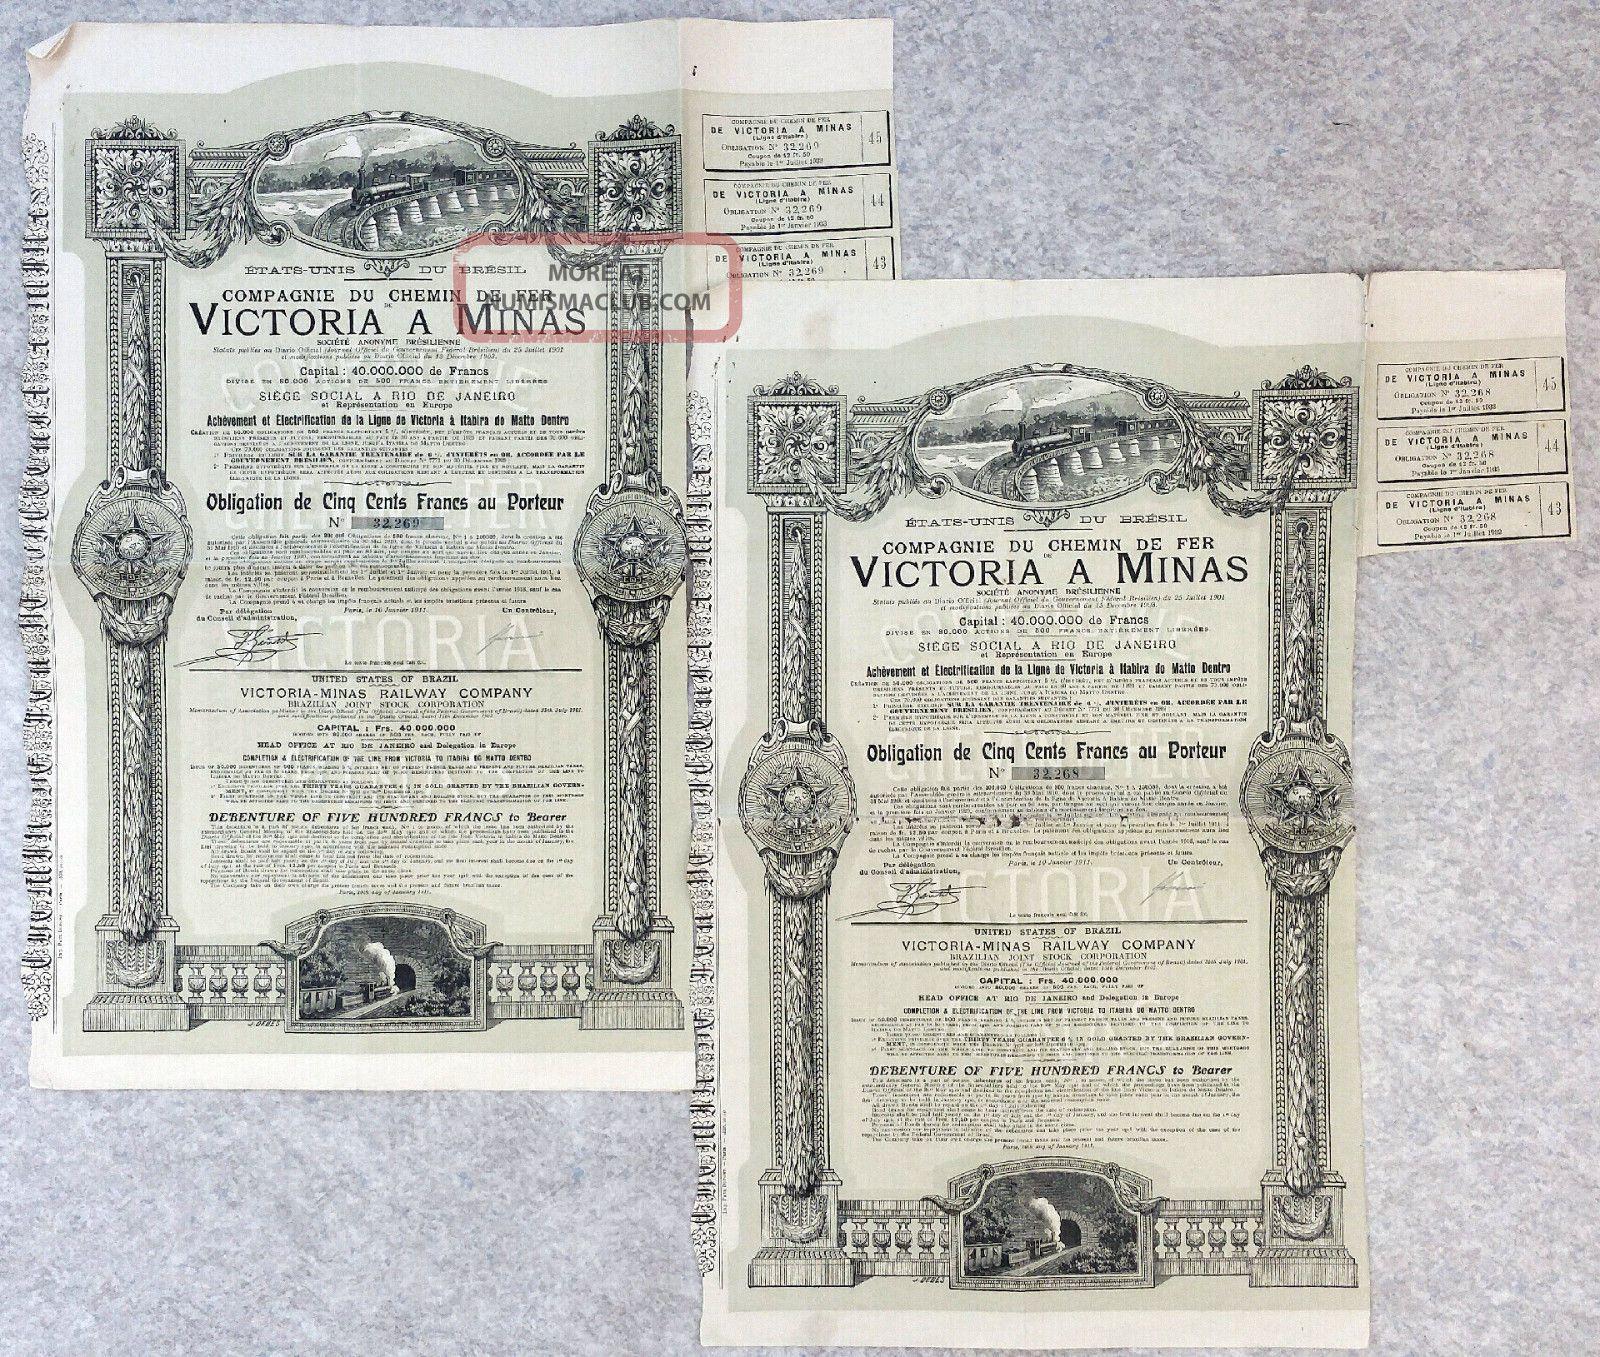 Brazil 1911 - Victoria A Minas Railway Co Bond Of 500 Frs X2 Stocks & Bonds, Scripophily photo